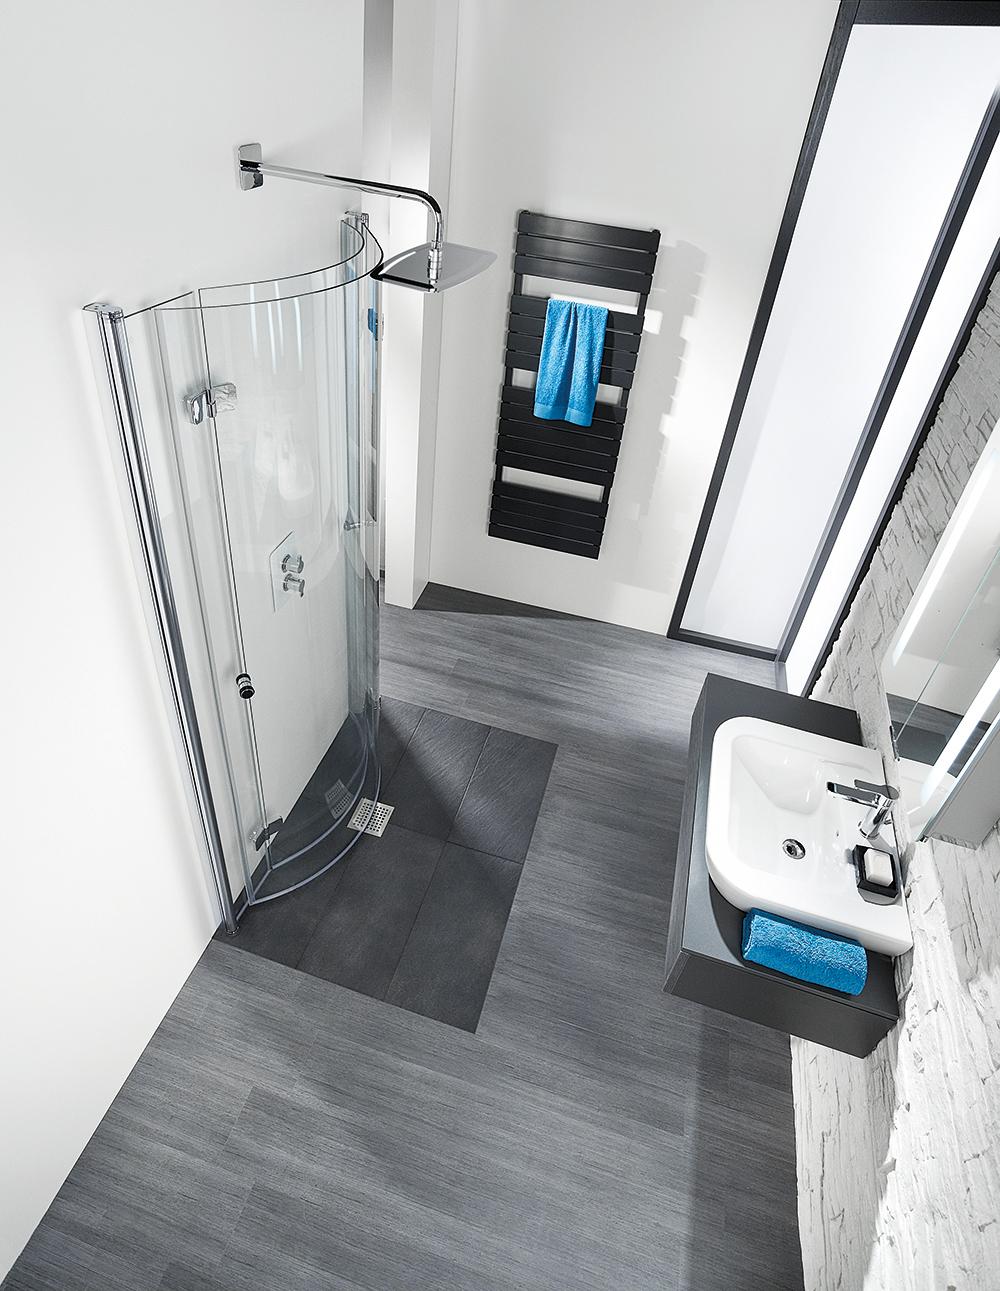 badsanierung berlin sanierung bad berlin b dersanierung. Black Bedroom Furniture Sets. Home Design Ideas